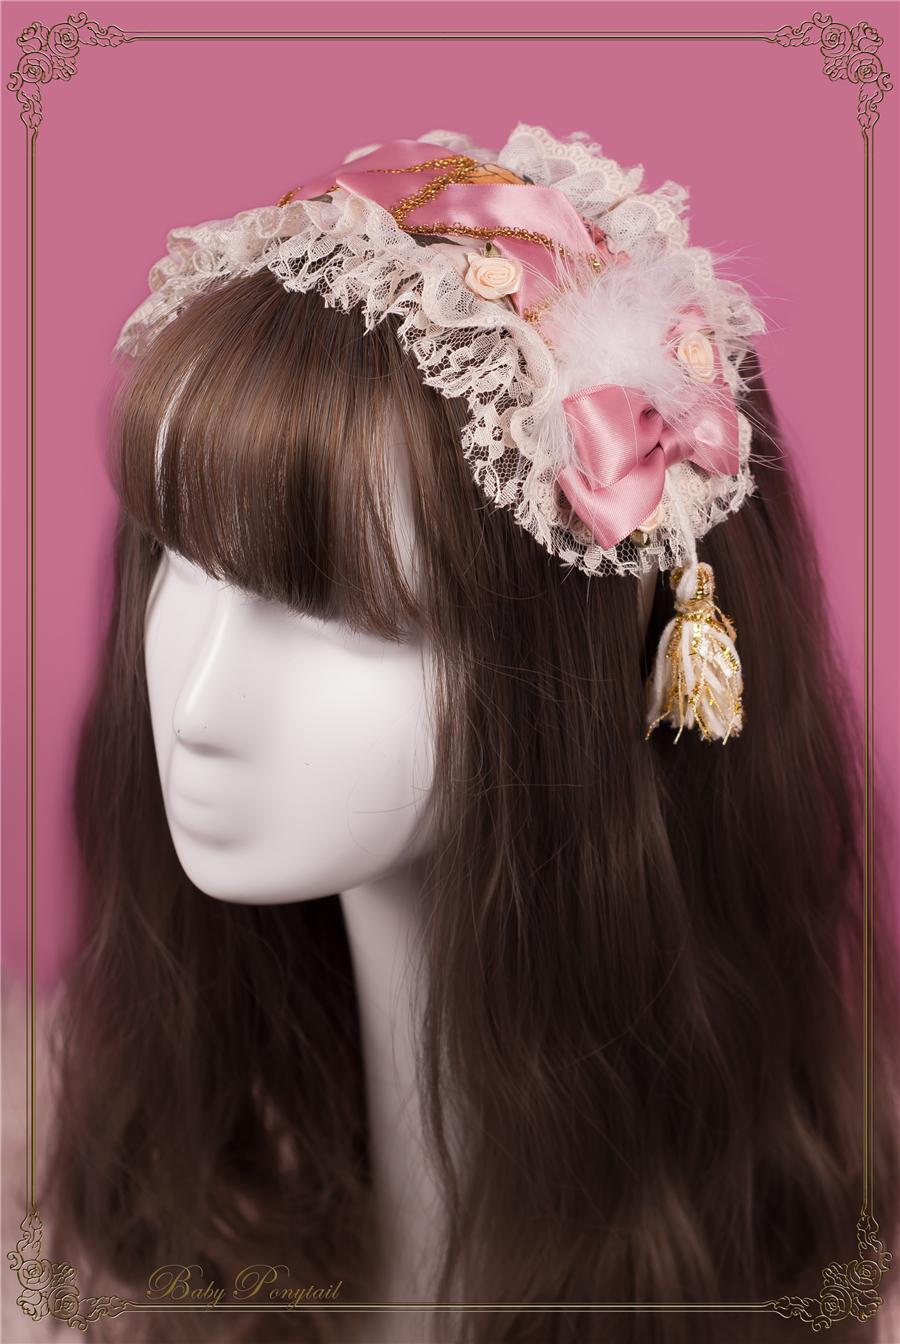 Babyponytail_Accessory_Tassel Head Dress_1.jpg